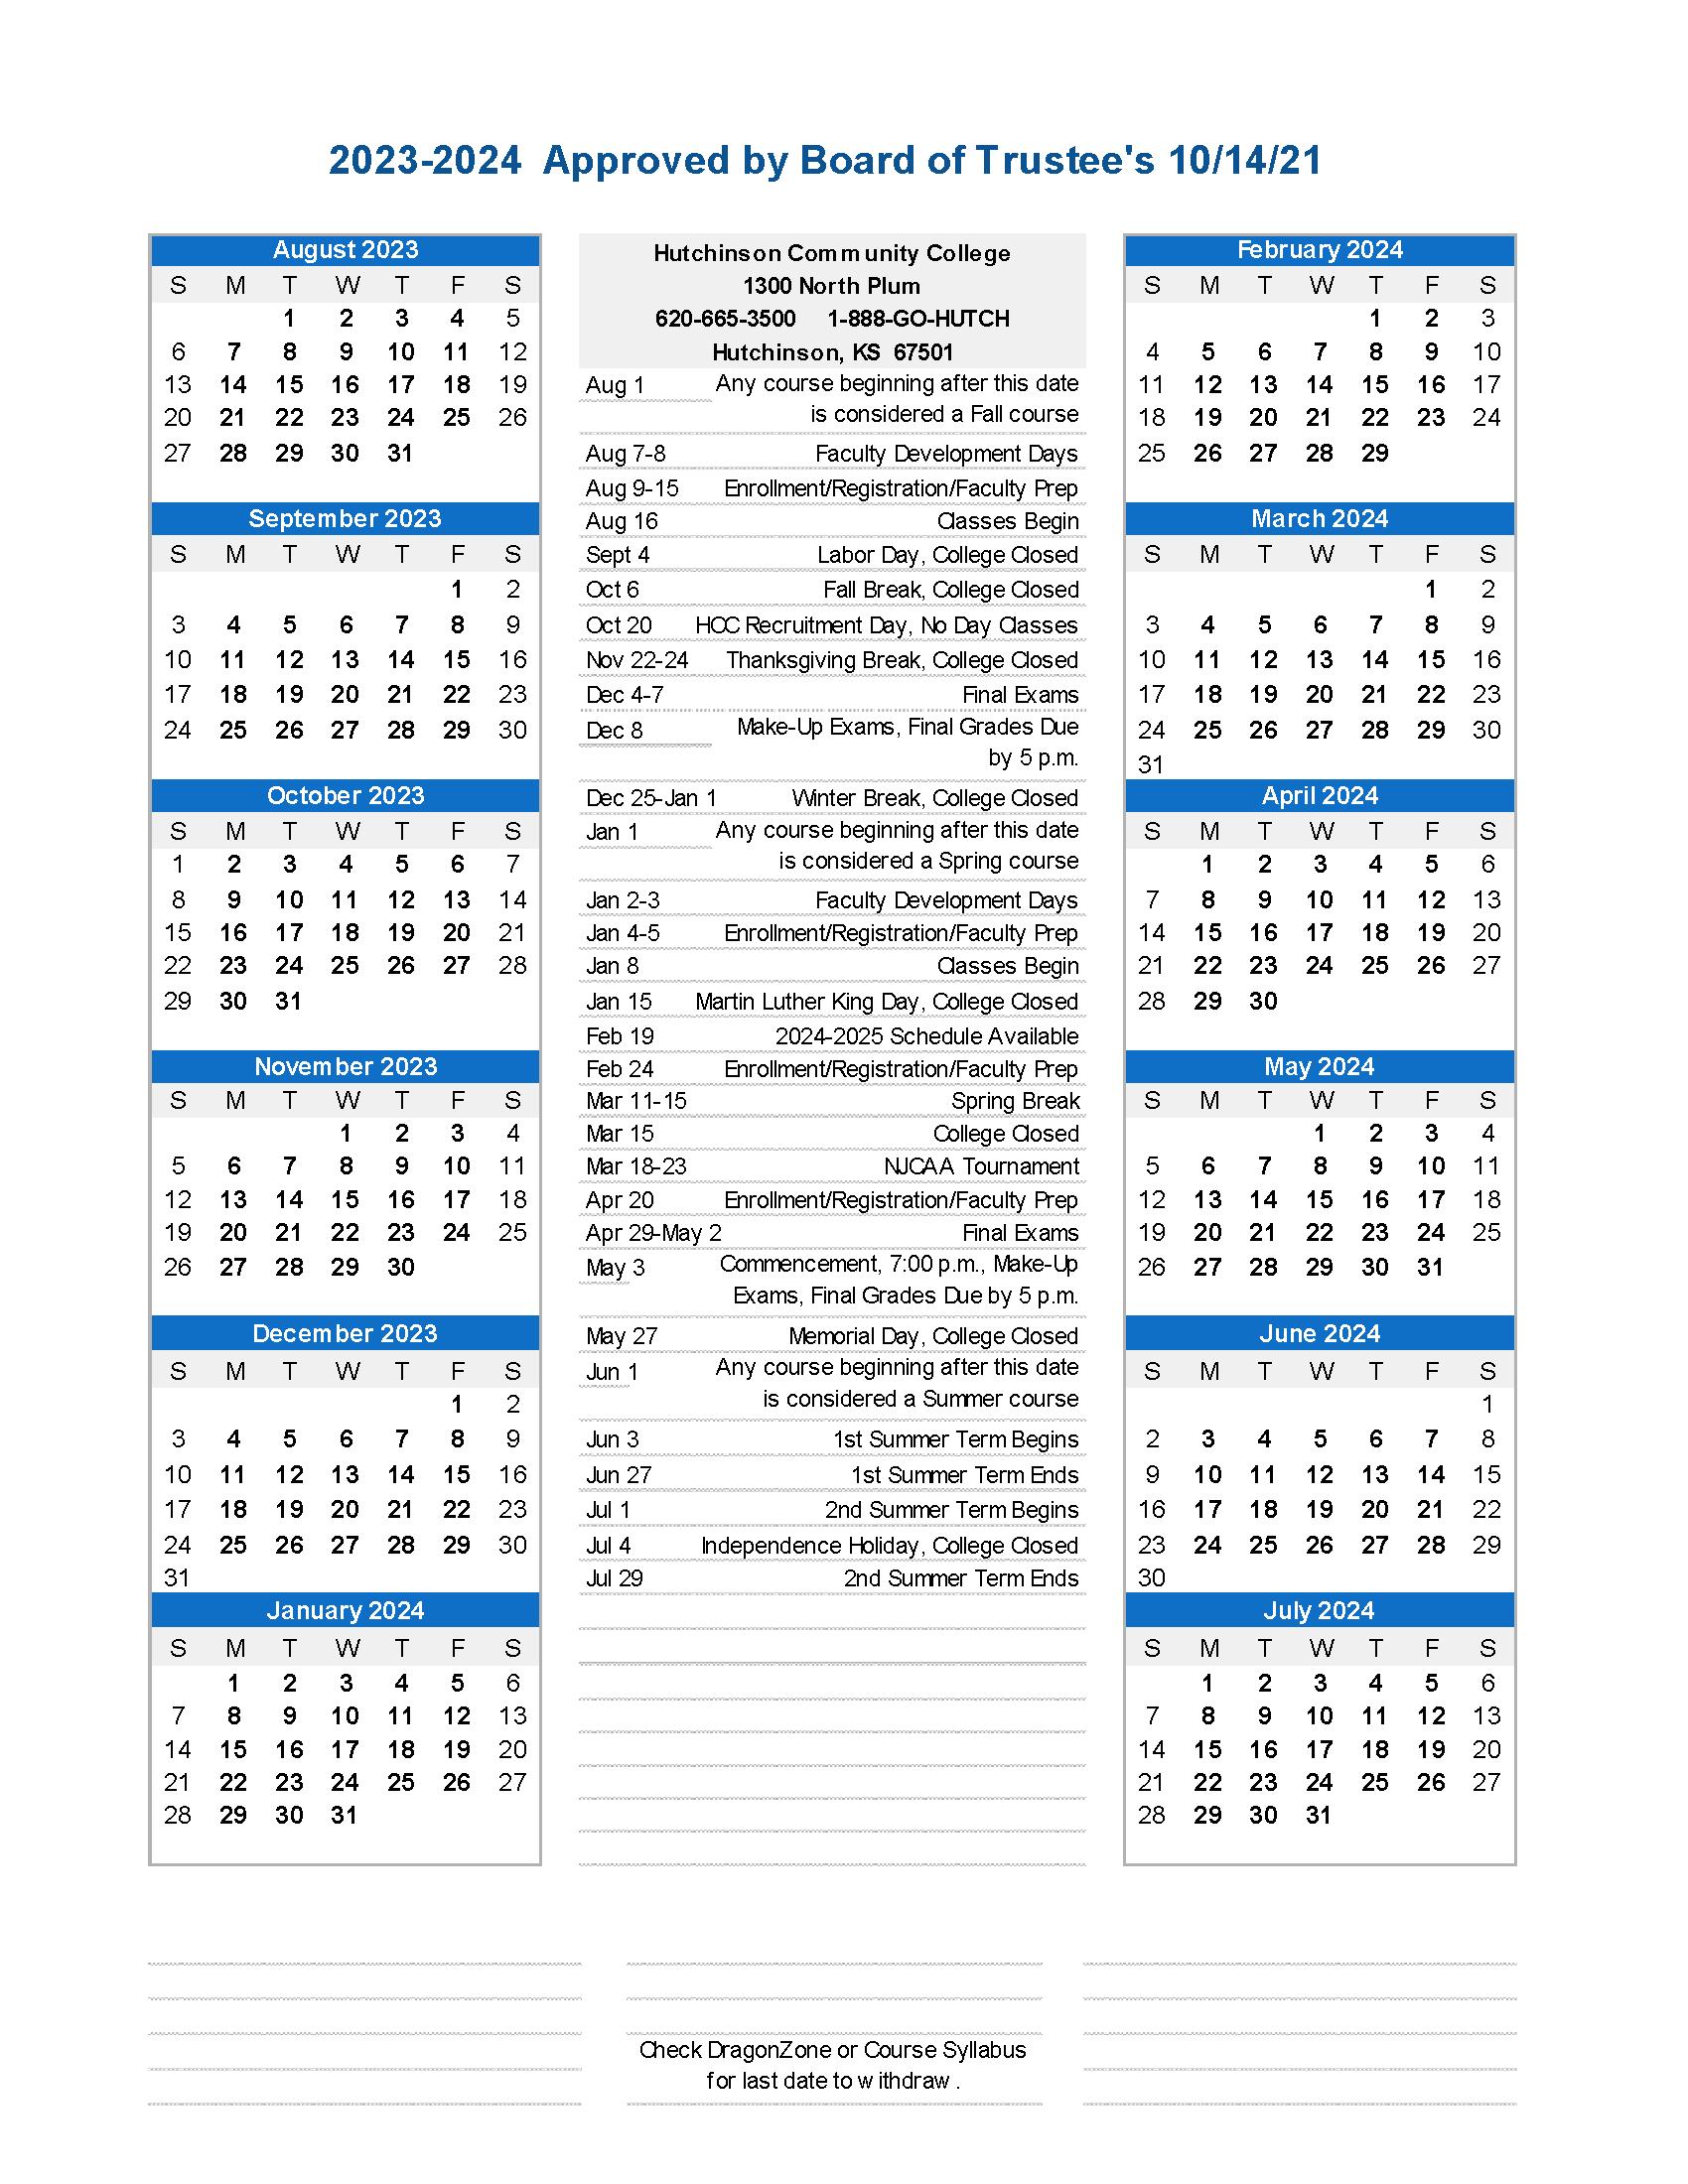 Academic Calendar - 2023-2024